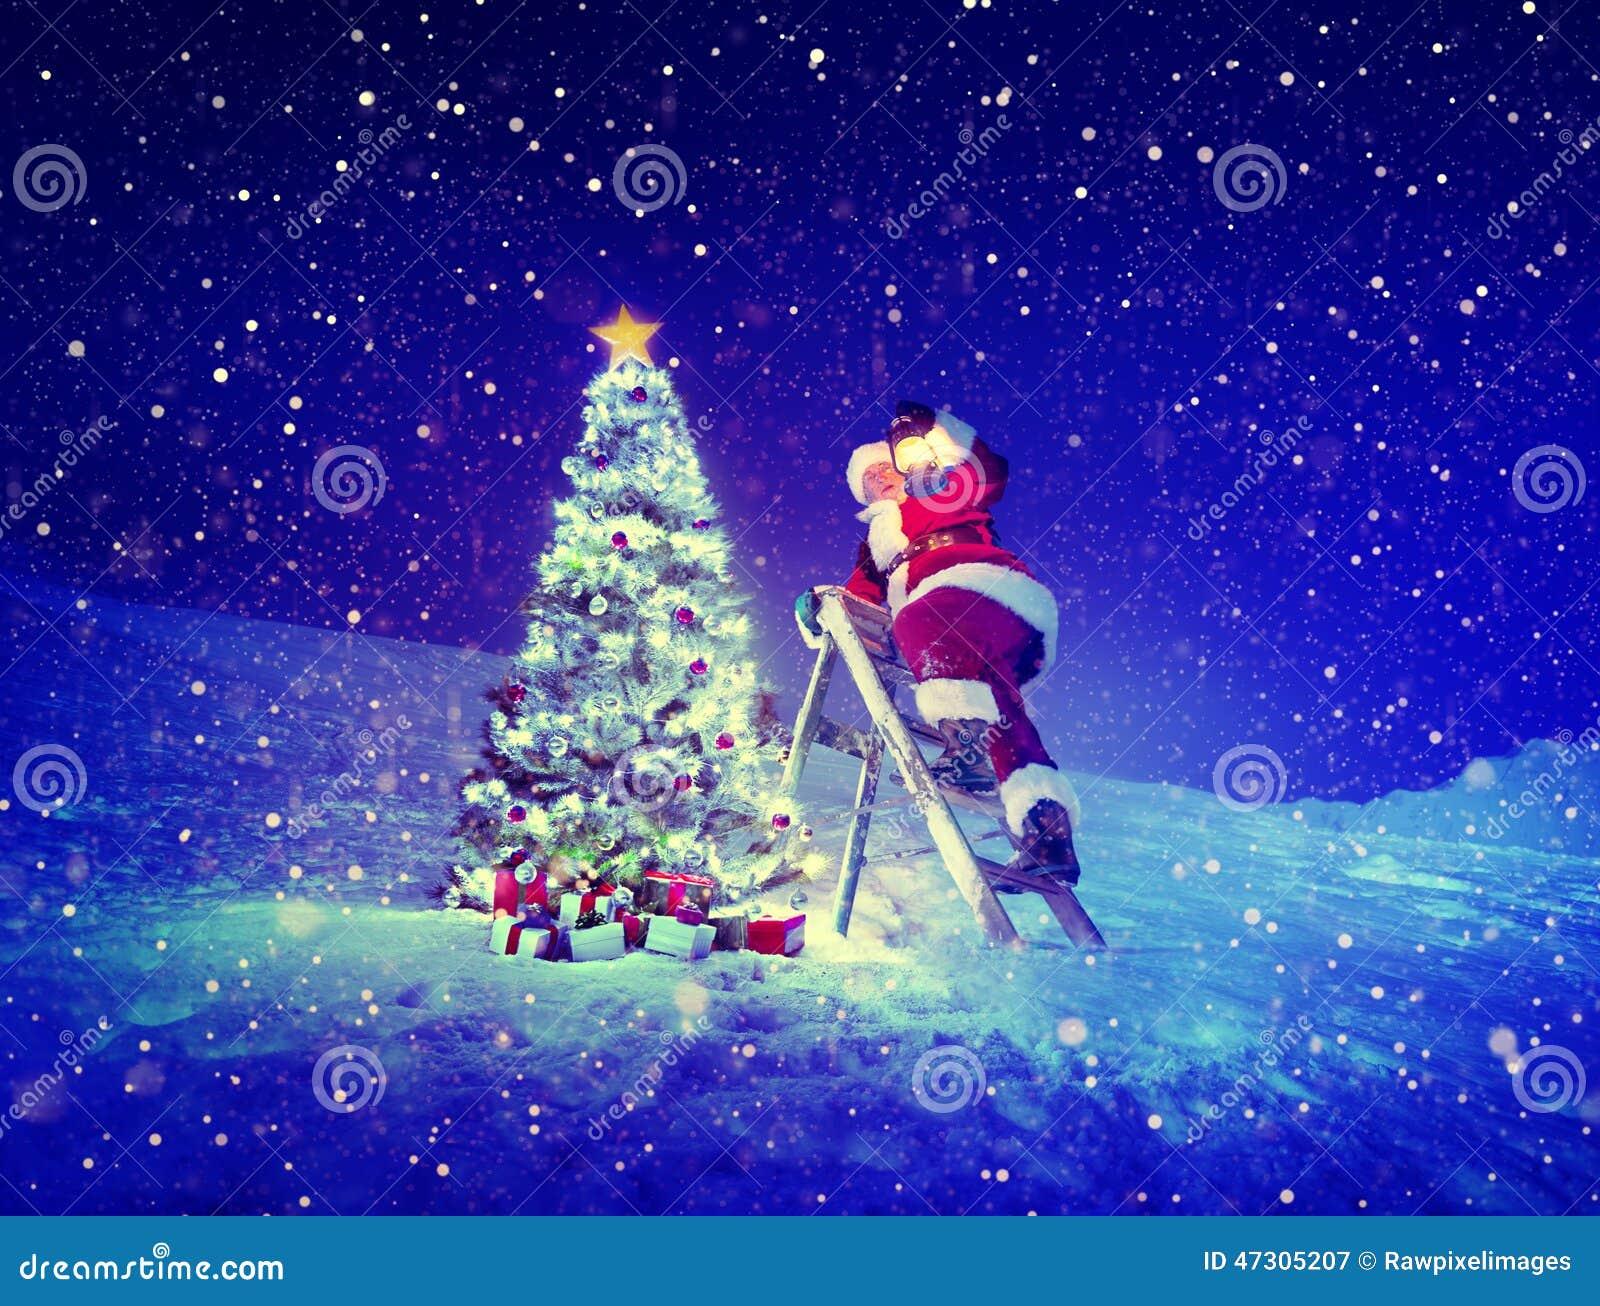 Santa Step-Ladder Christmas Tree Snow-Konzept Stockbild - Bild von ...